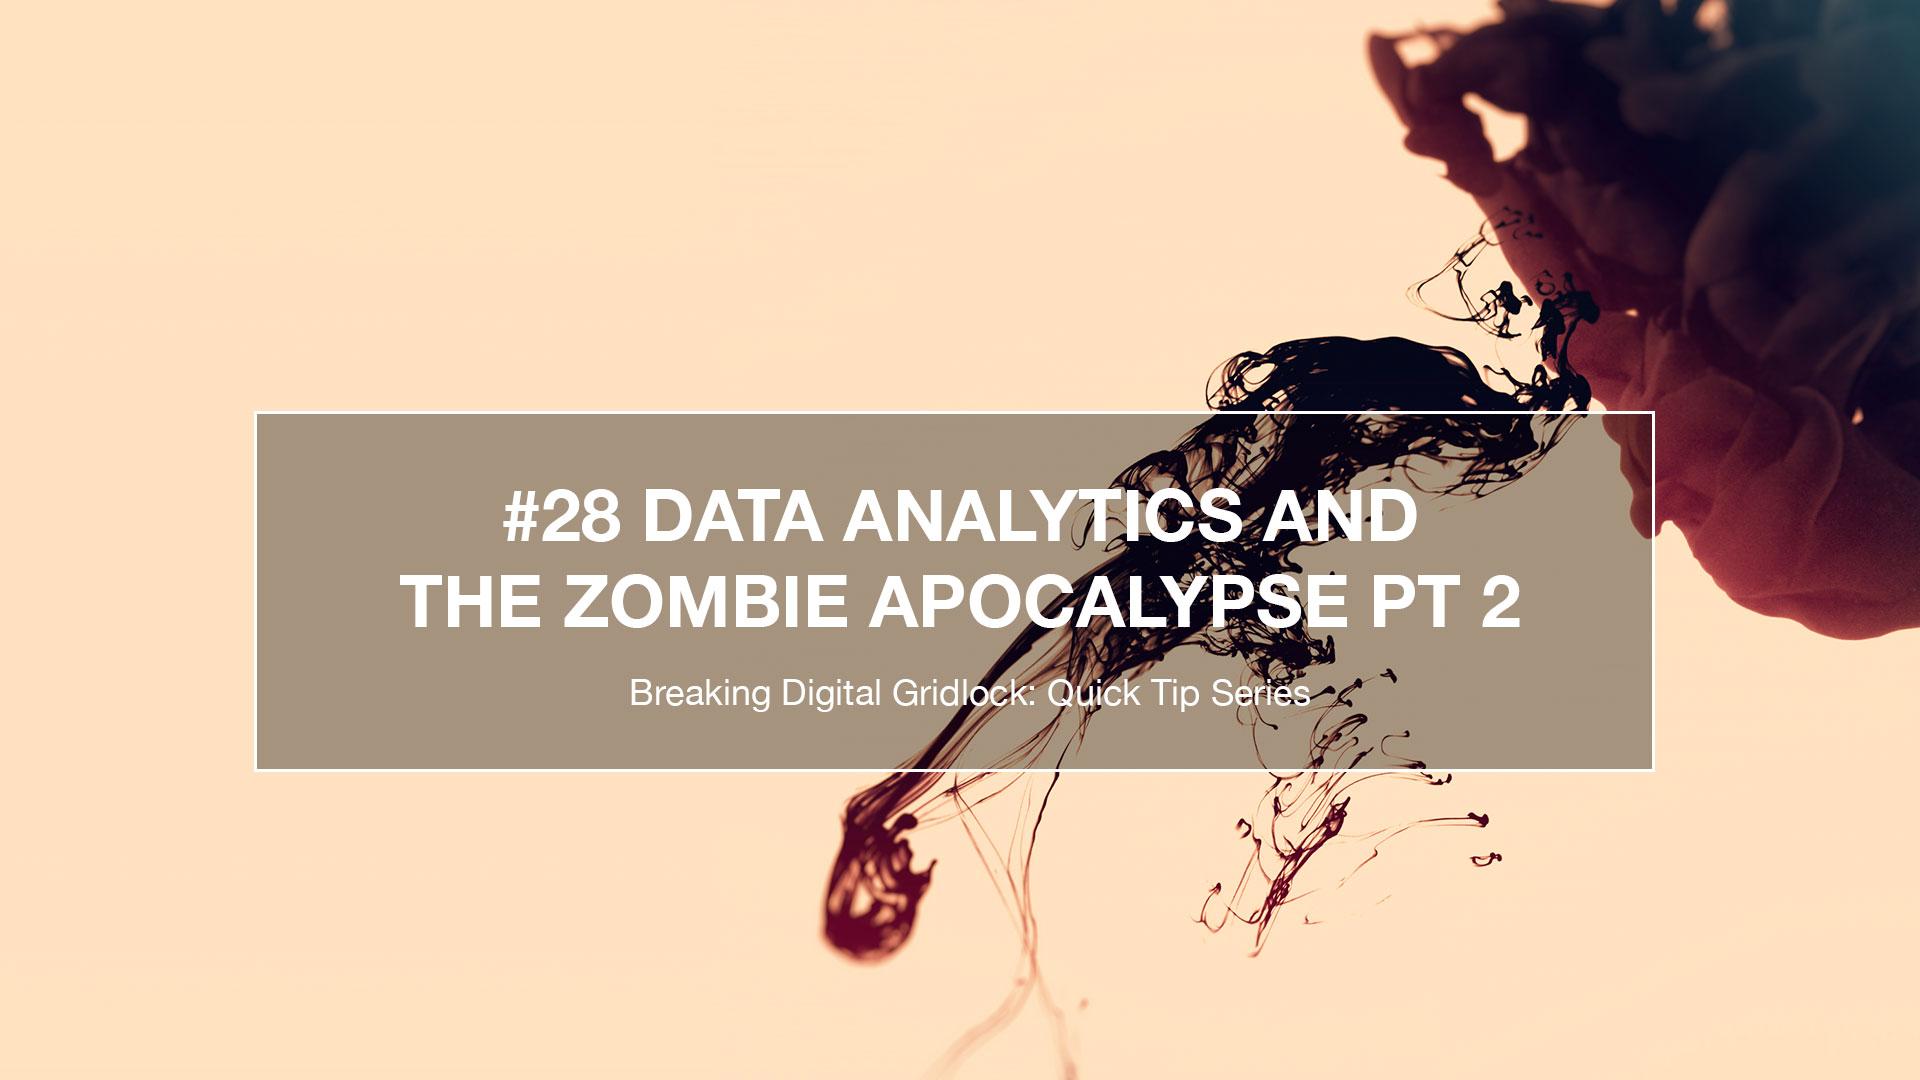 Breaking Weekly Digital Gridlock # 28: Data Analytics and the Zombie Apocalypse Pt. 2